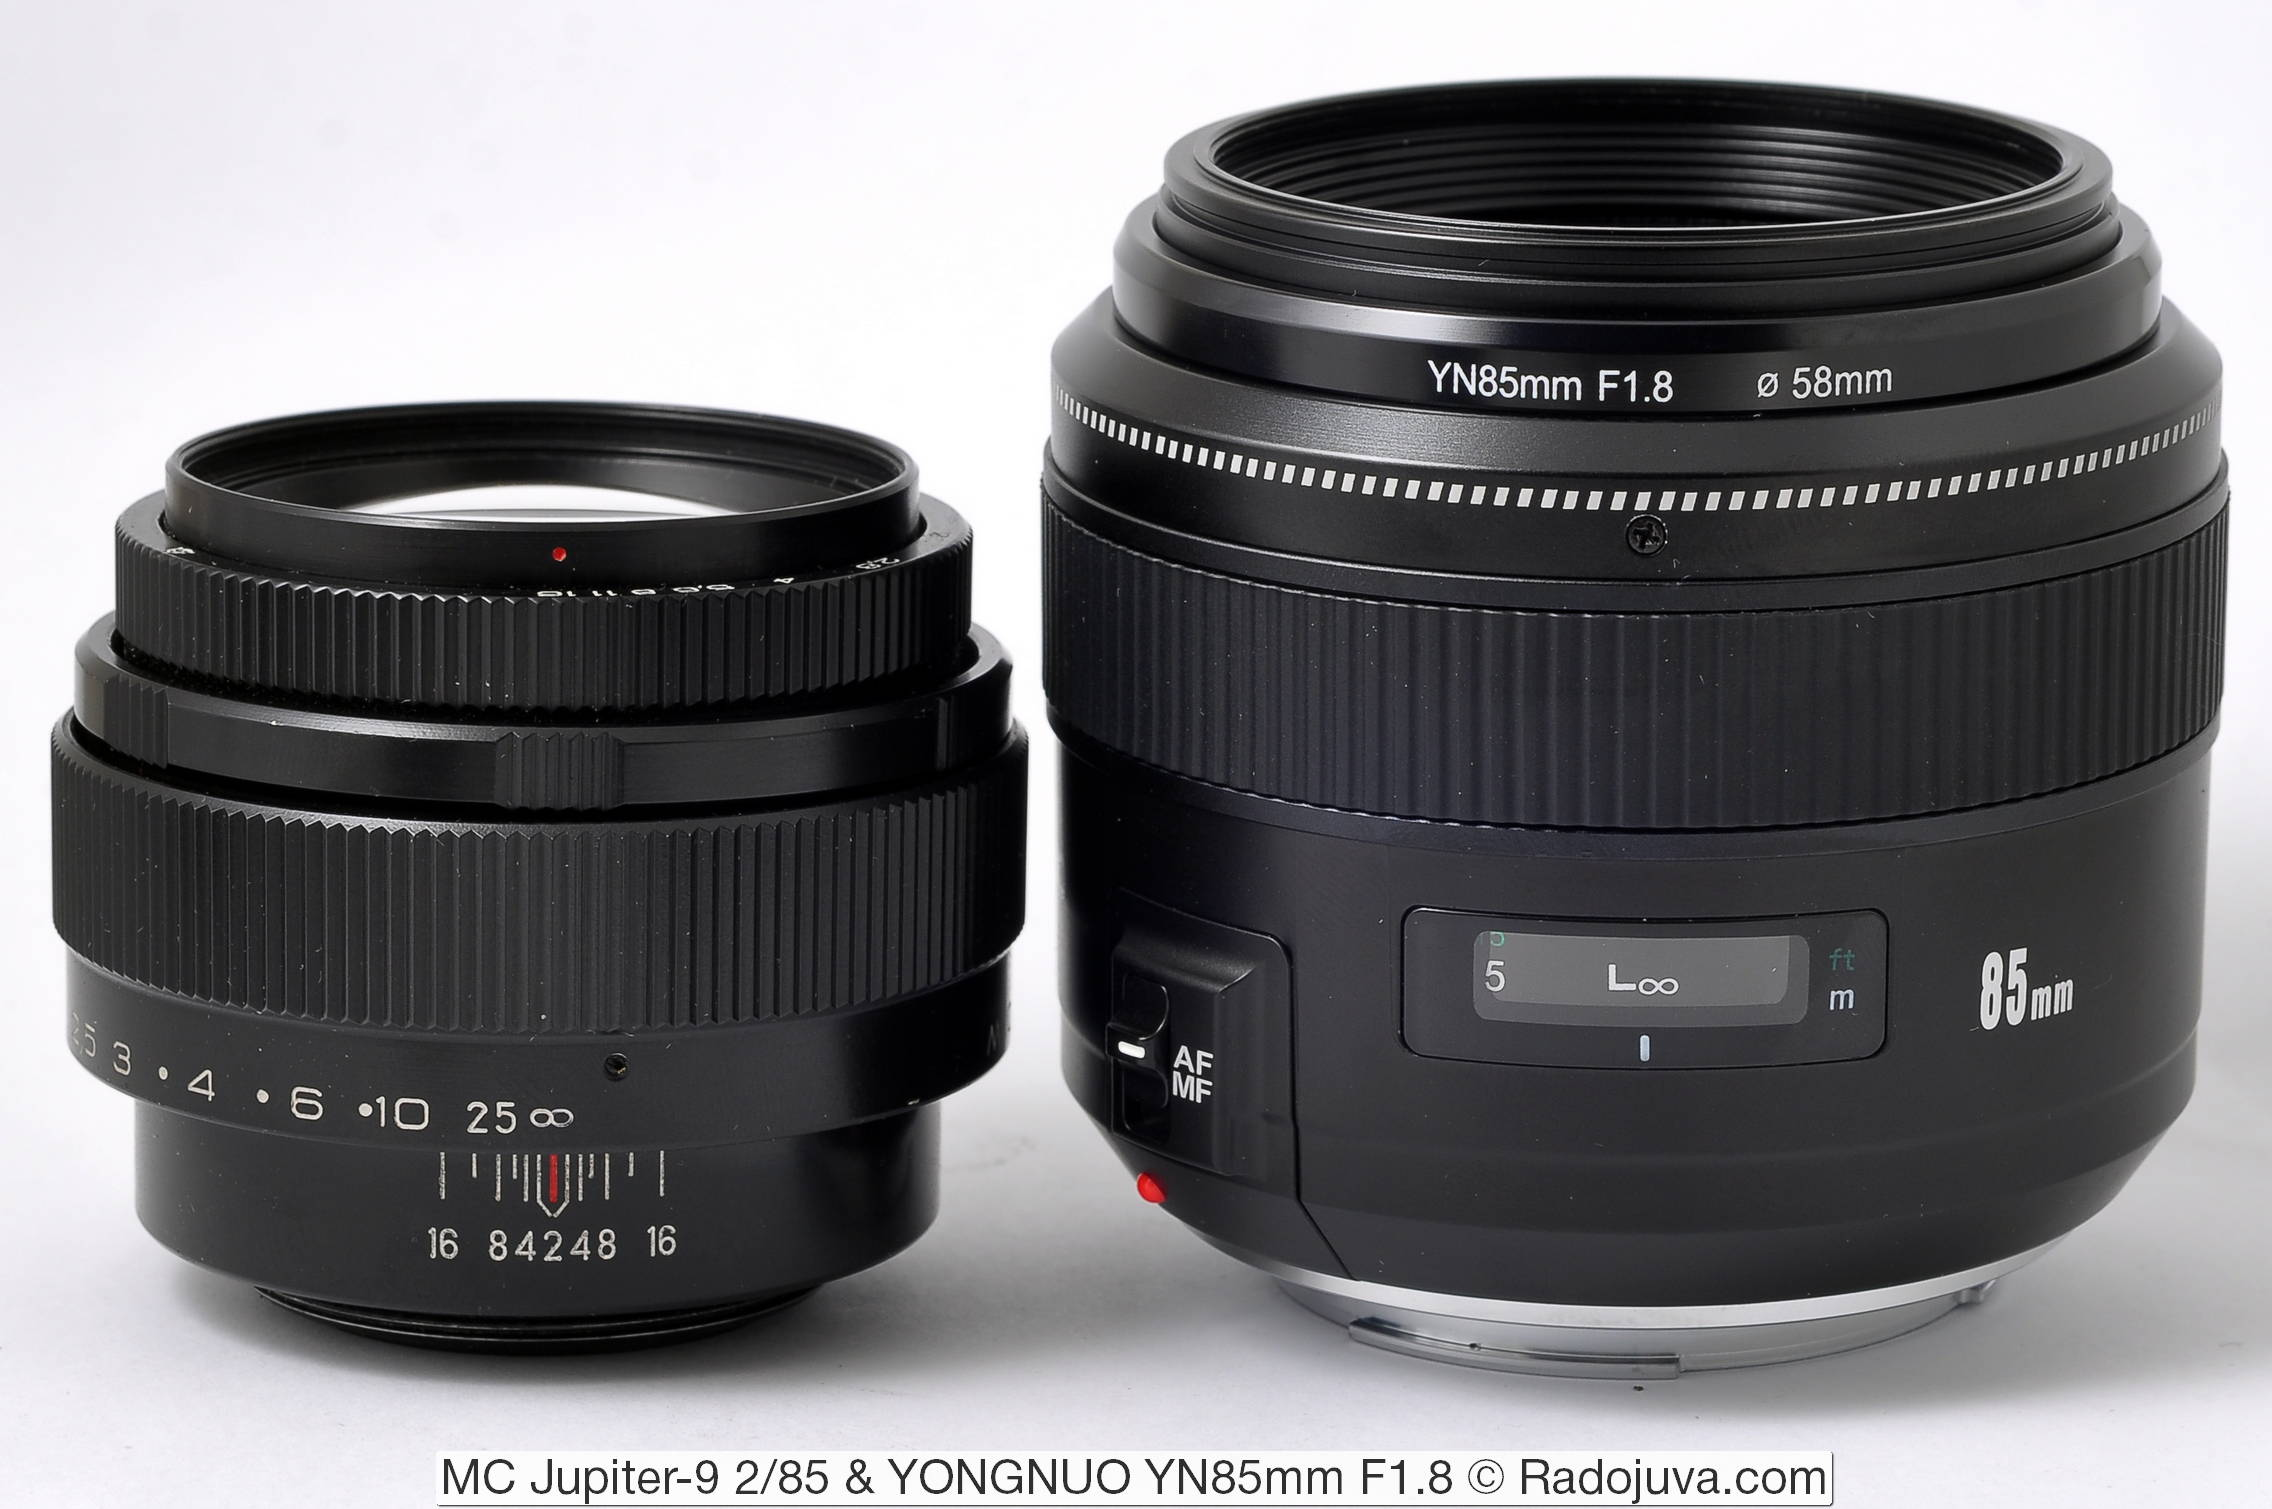 MC Jupiter-9 2/85 и YONGNUO YN85mm F1.8 (для Canon EF)